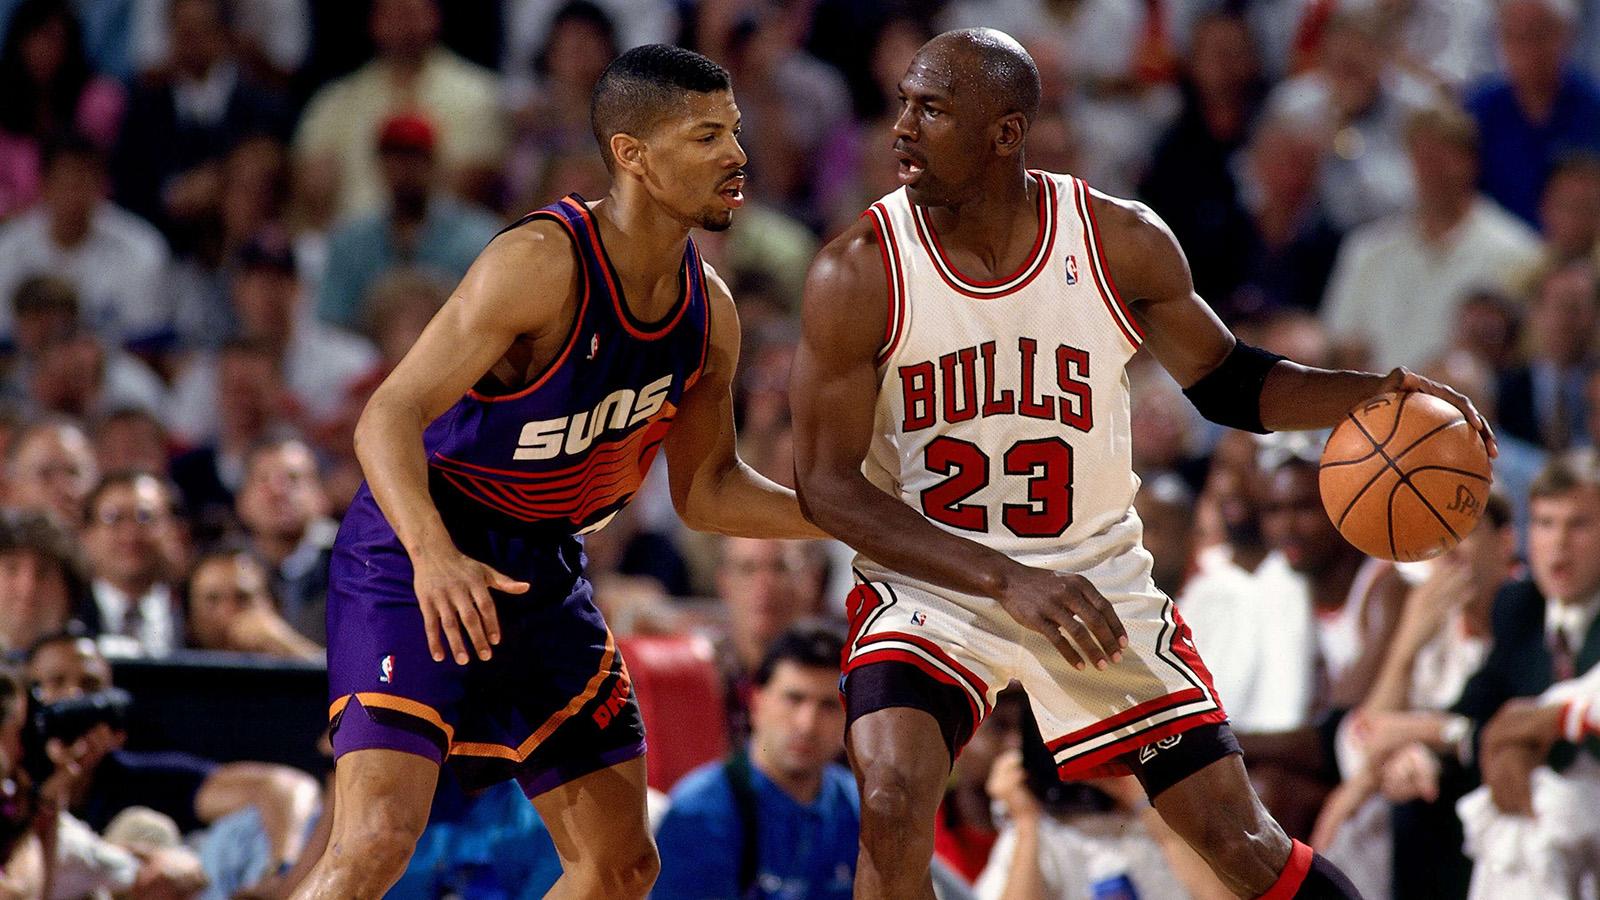 Michael Jordan in the 1993 NBA Finals